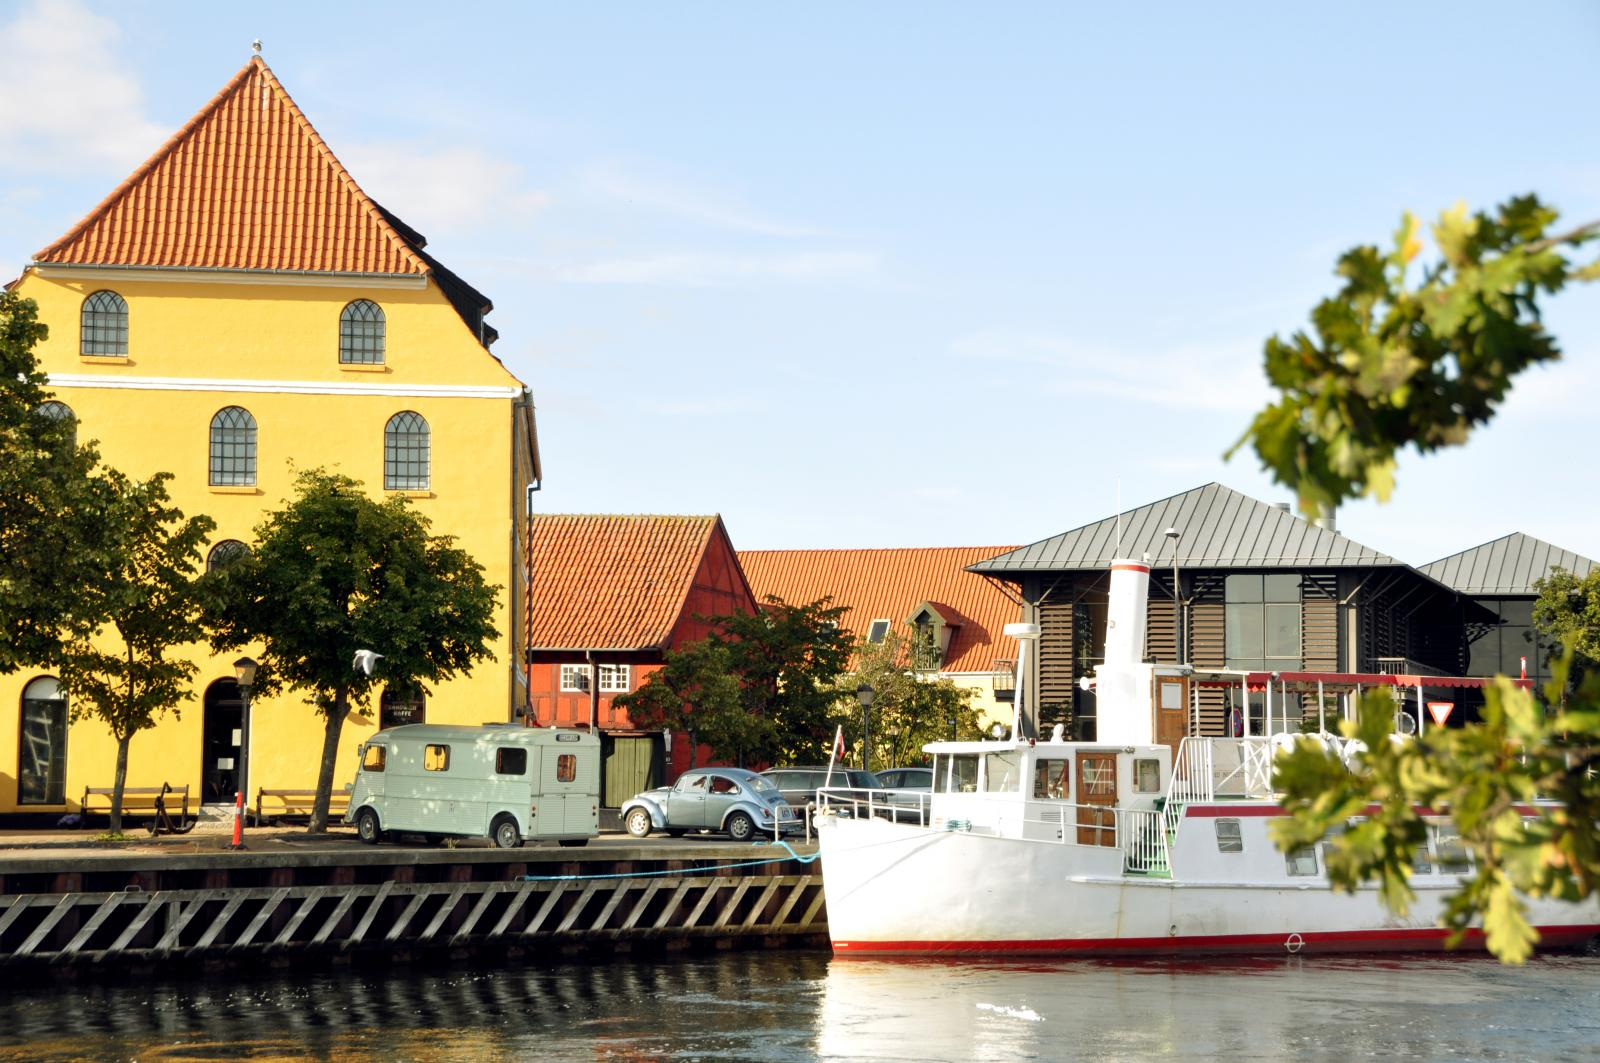 HY Treffen 2017 in Skælskør, Dänemark